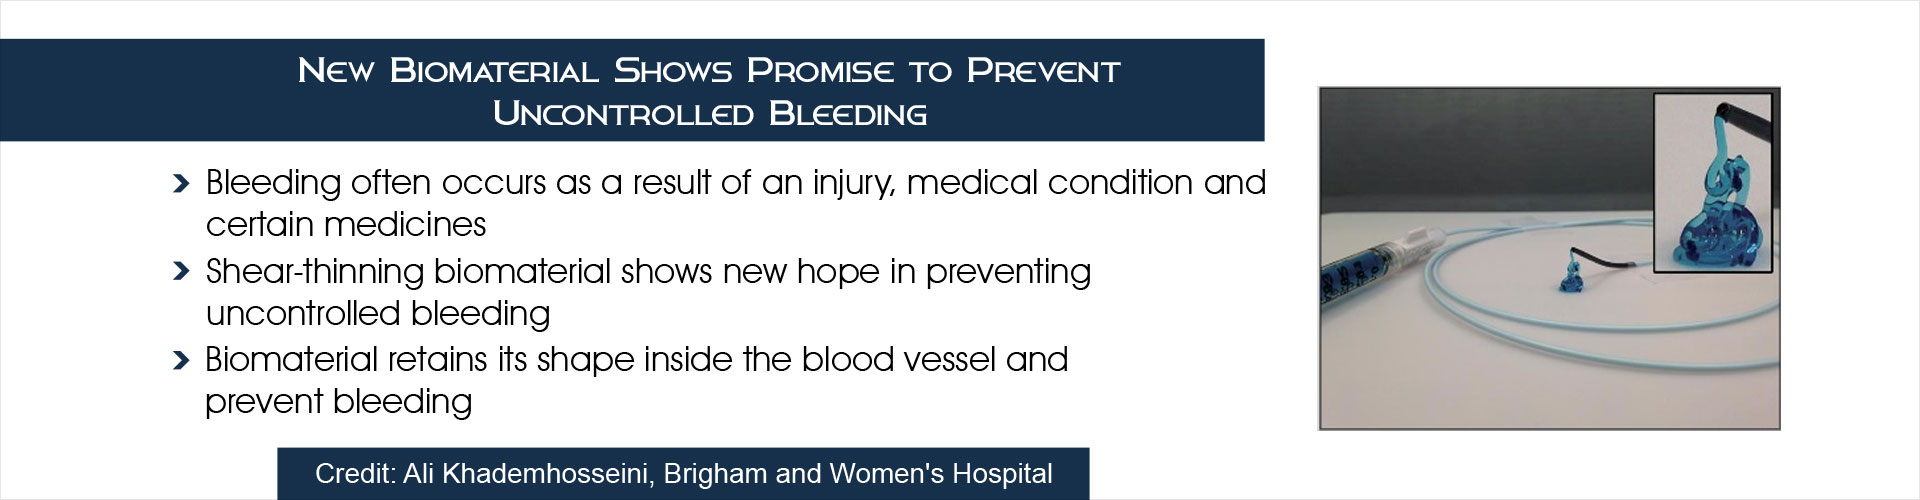 Novel Shear-Thinning Biomaterial Shows New Hope to Prevent Bleeding